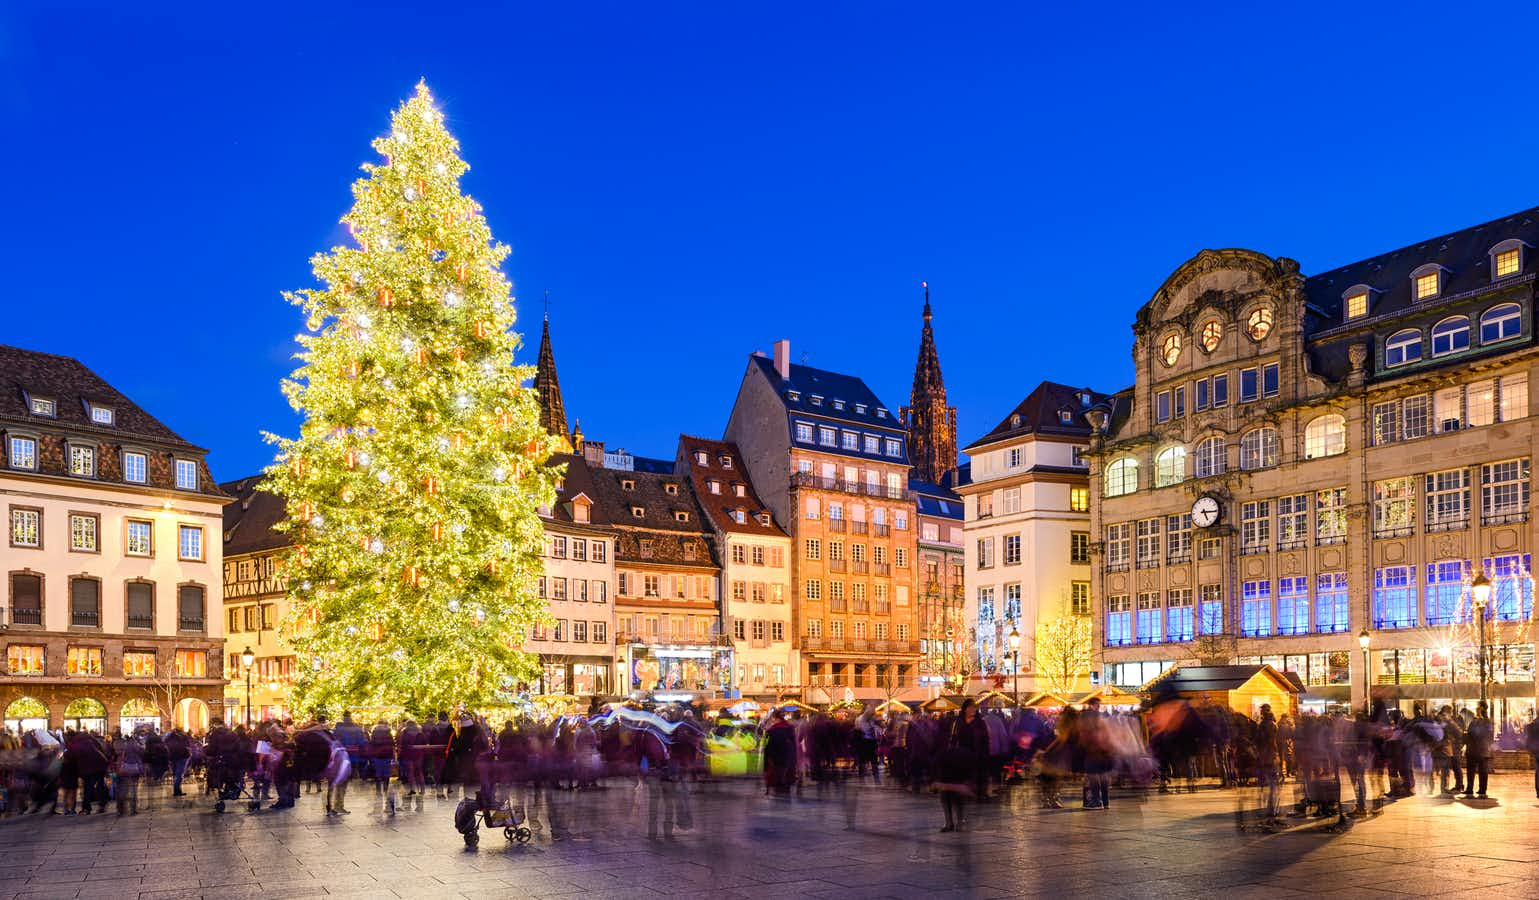 Metz Christmas Market 2021 Tour The Black Forest Christmas Markets Of Strasbourg Colmar Freiburg Leger Holidays Mgf